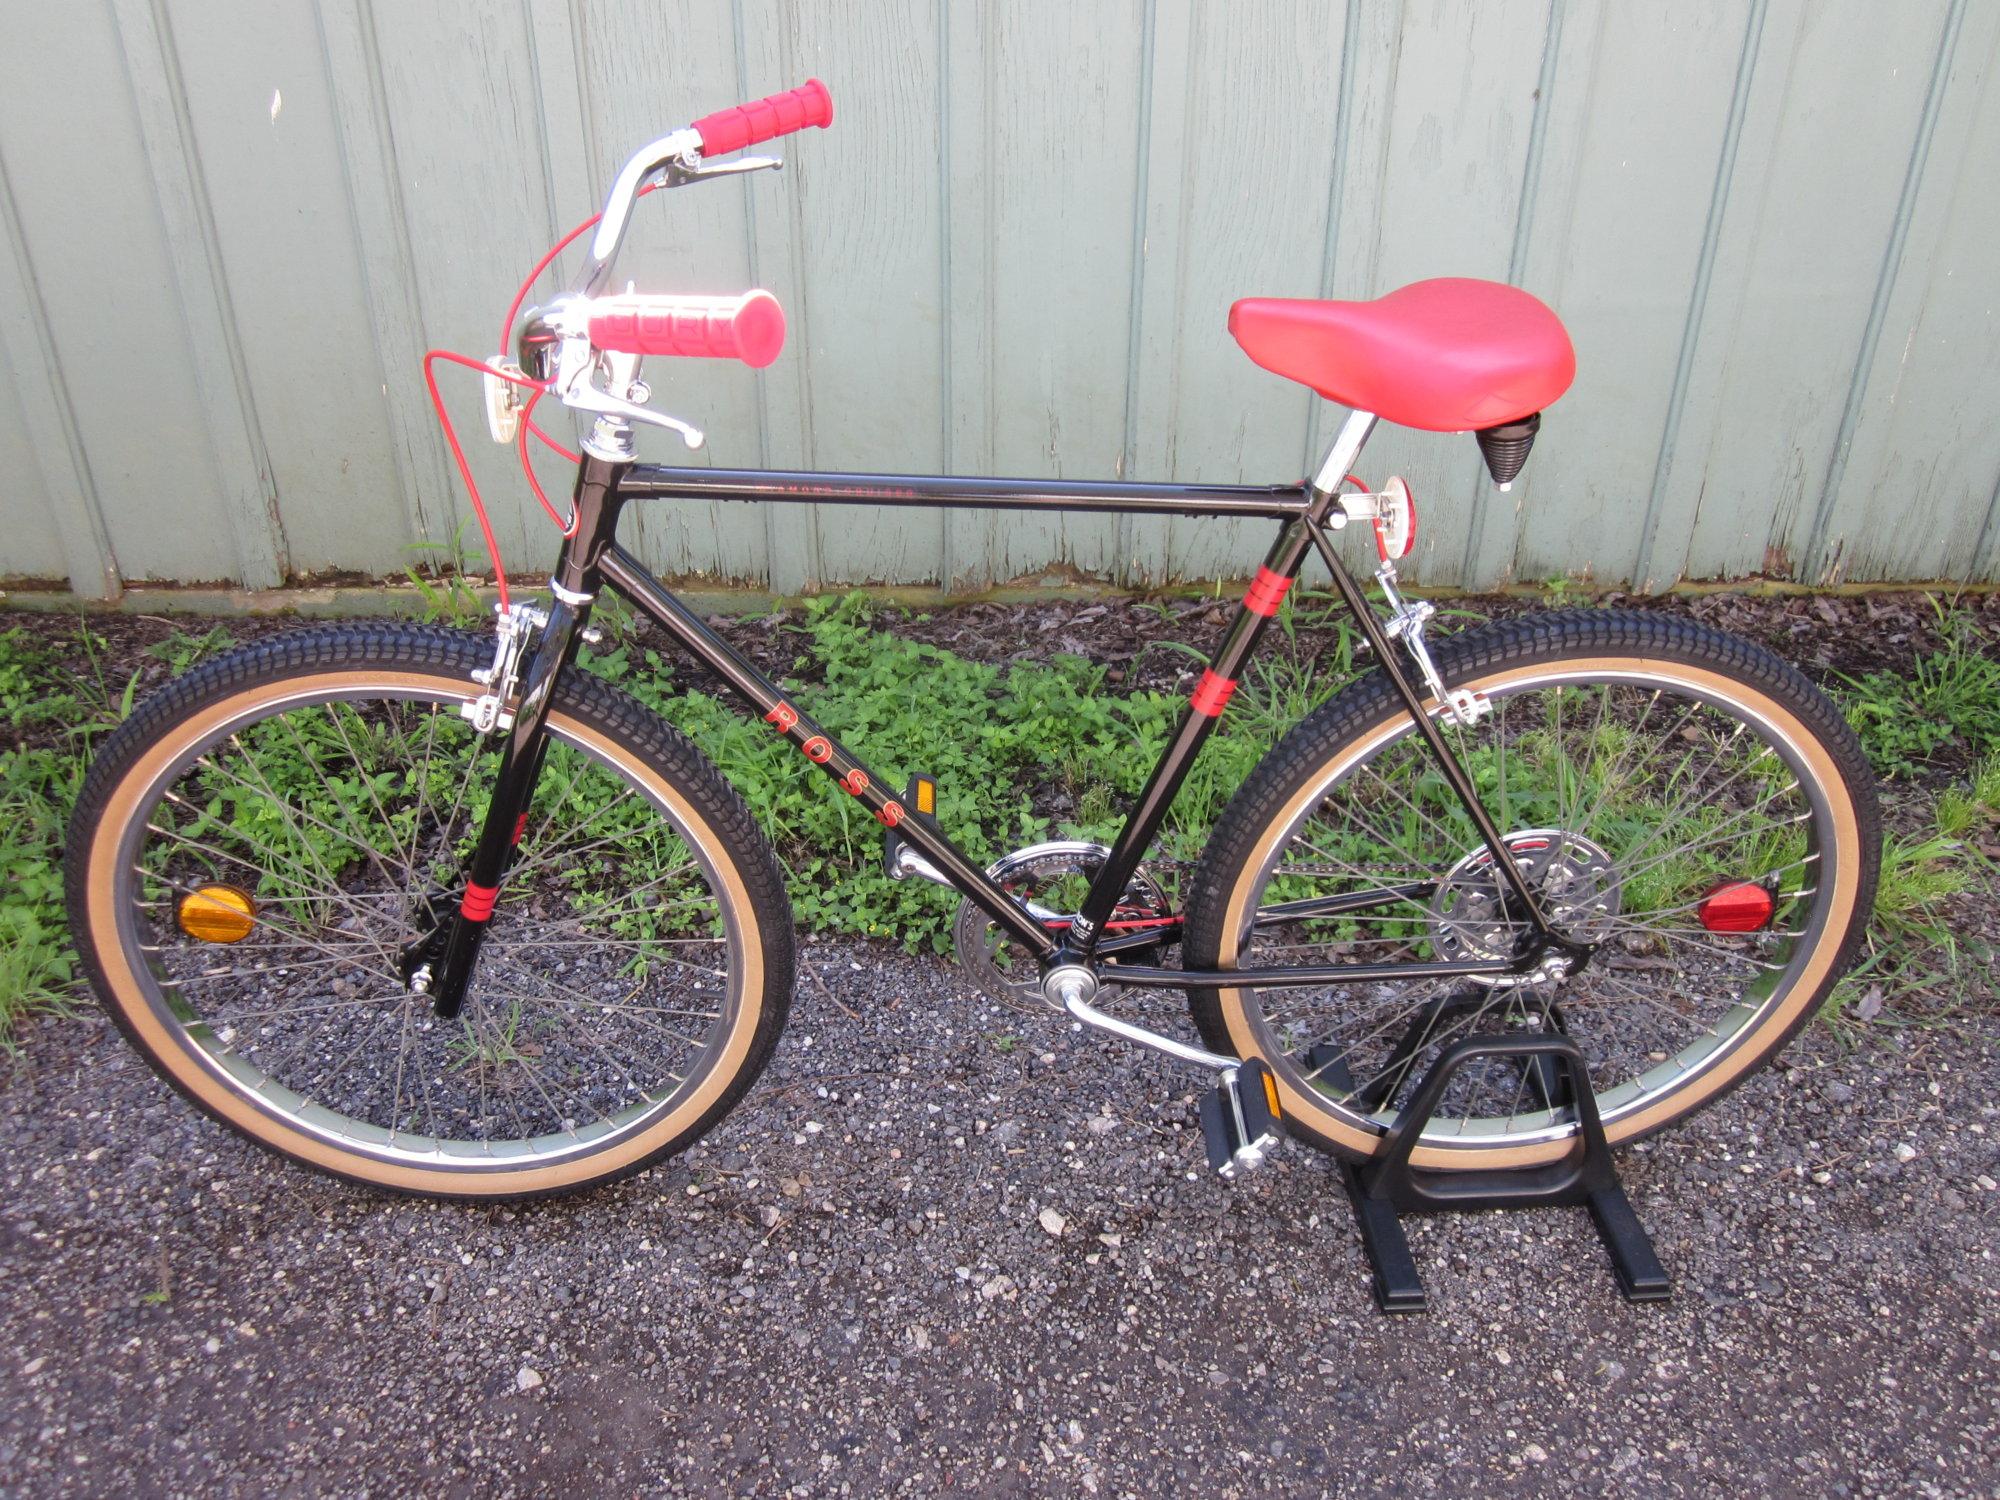 Ross Bike 020.JPG